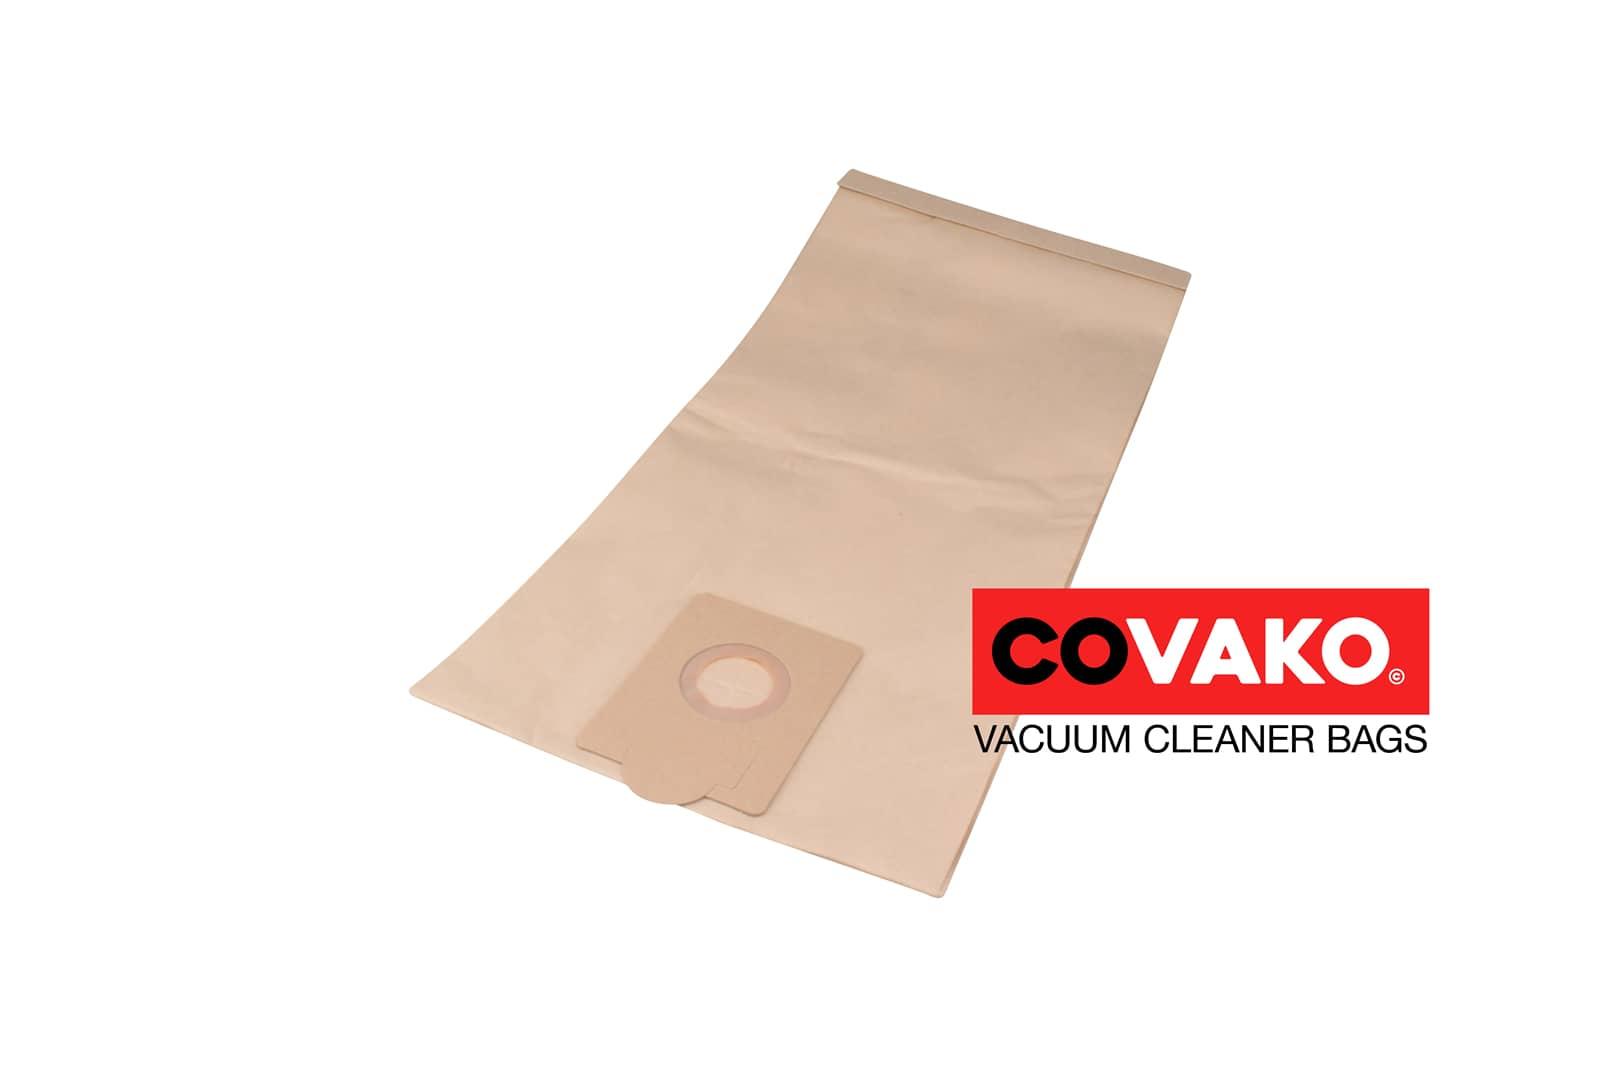 Kenter CA 60 / Papier - Kenter stofzuigerzakken